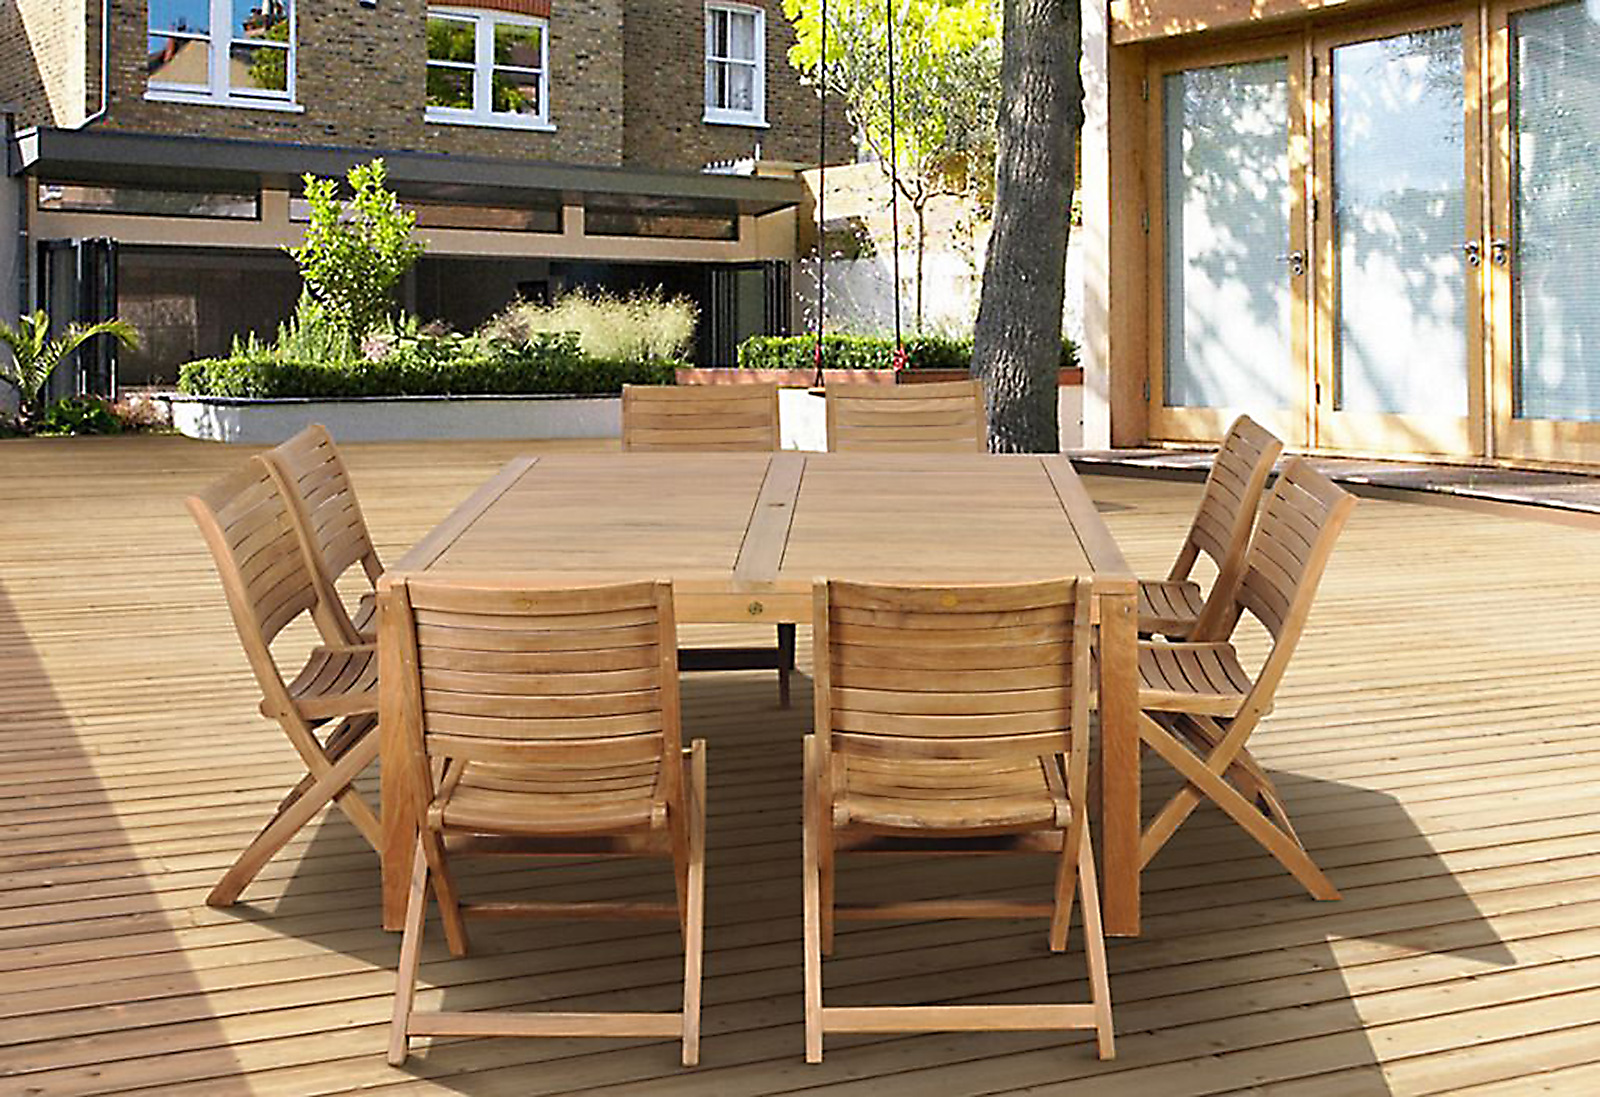 Cabana 9 Piece Square Teak Wood Patio Dining Set